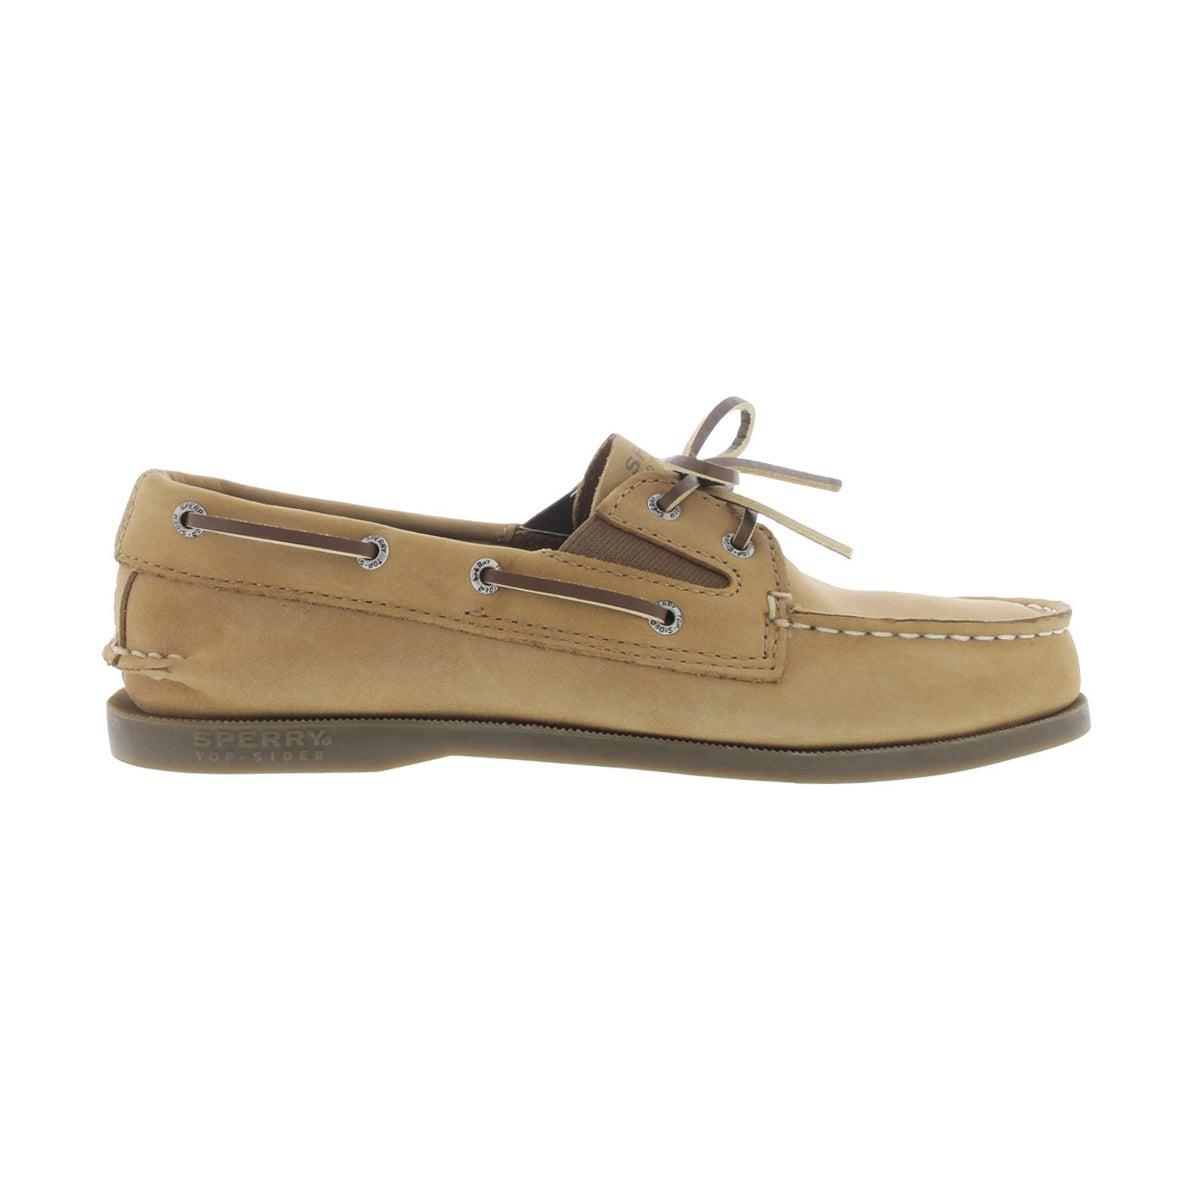 Bys A/O Slip On sahara lthr boat shoe